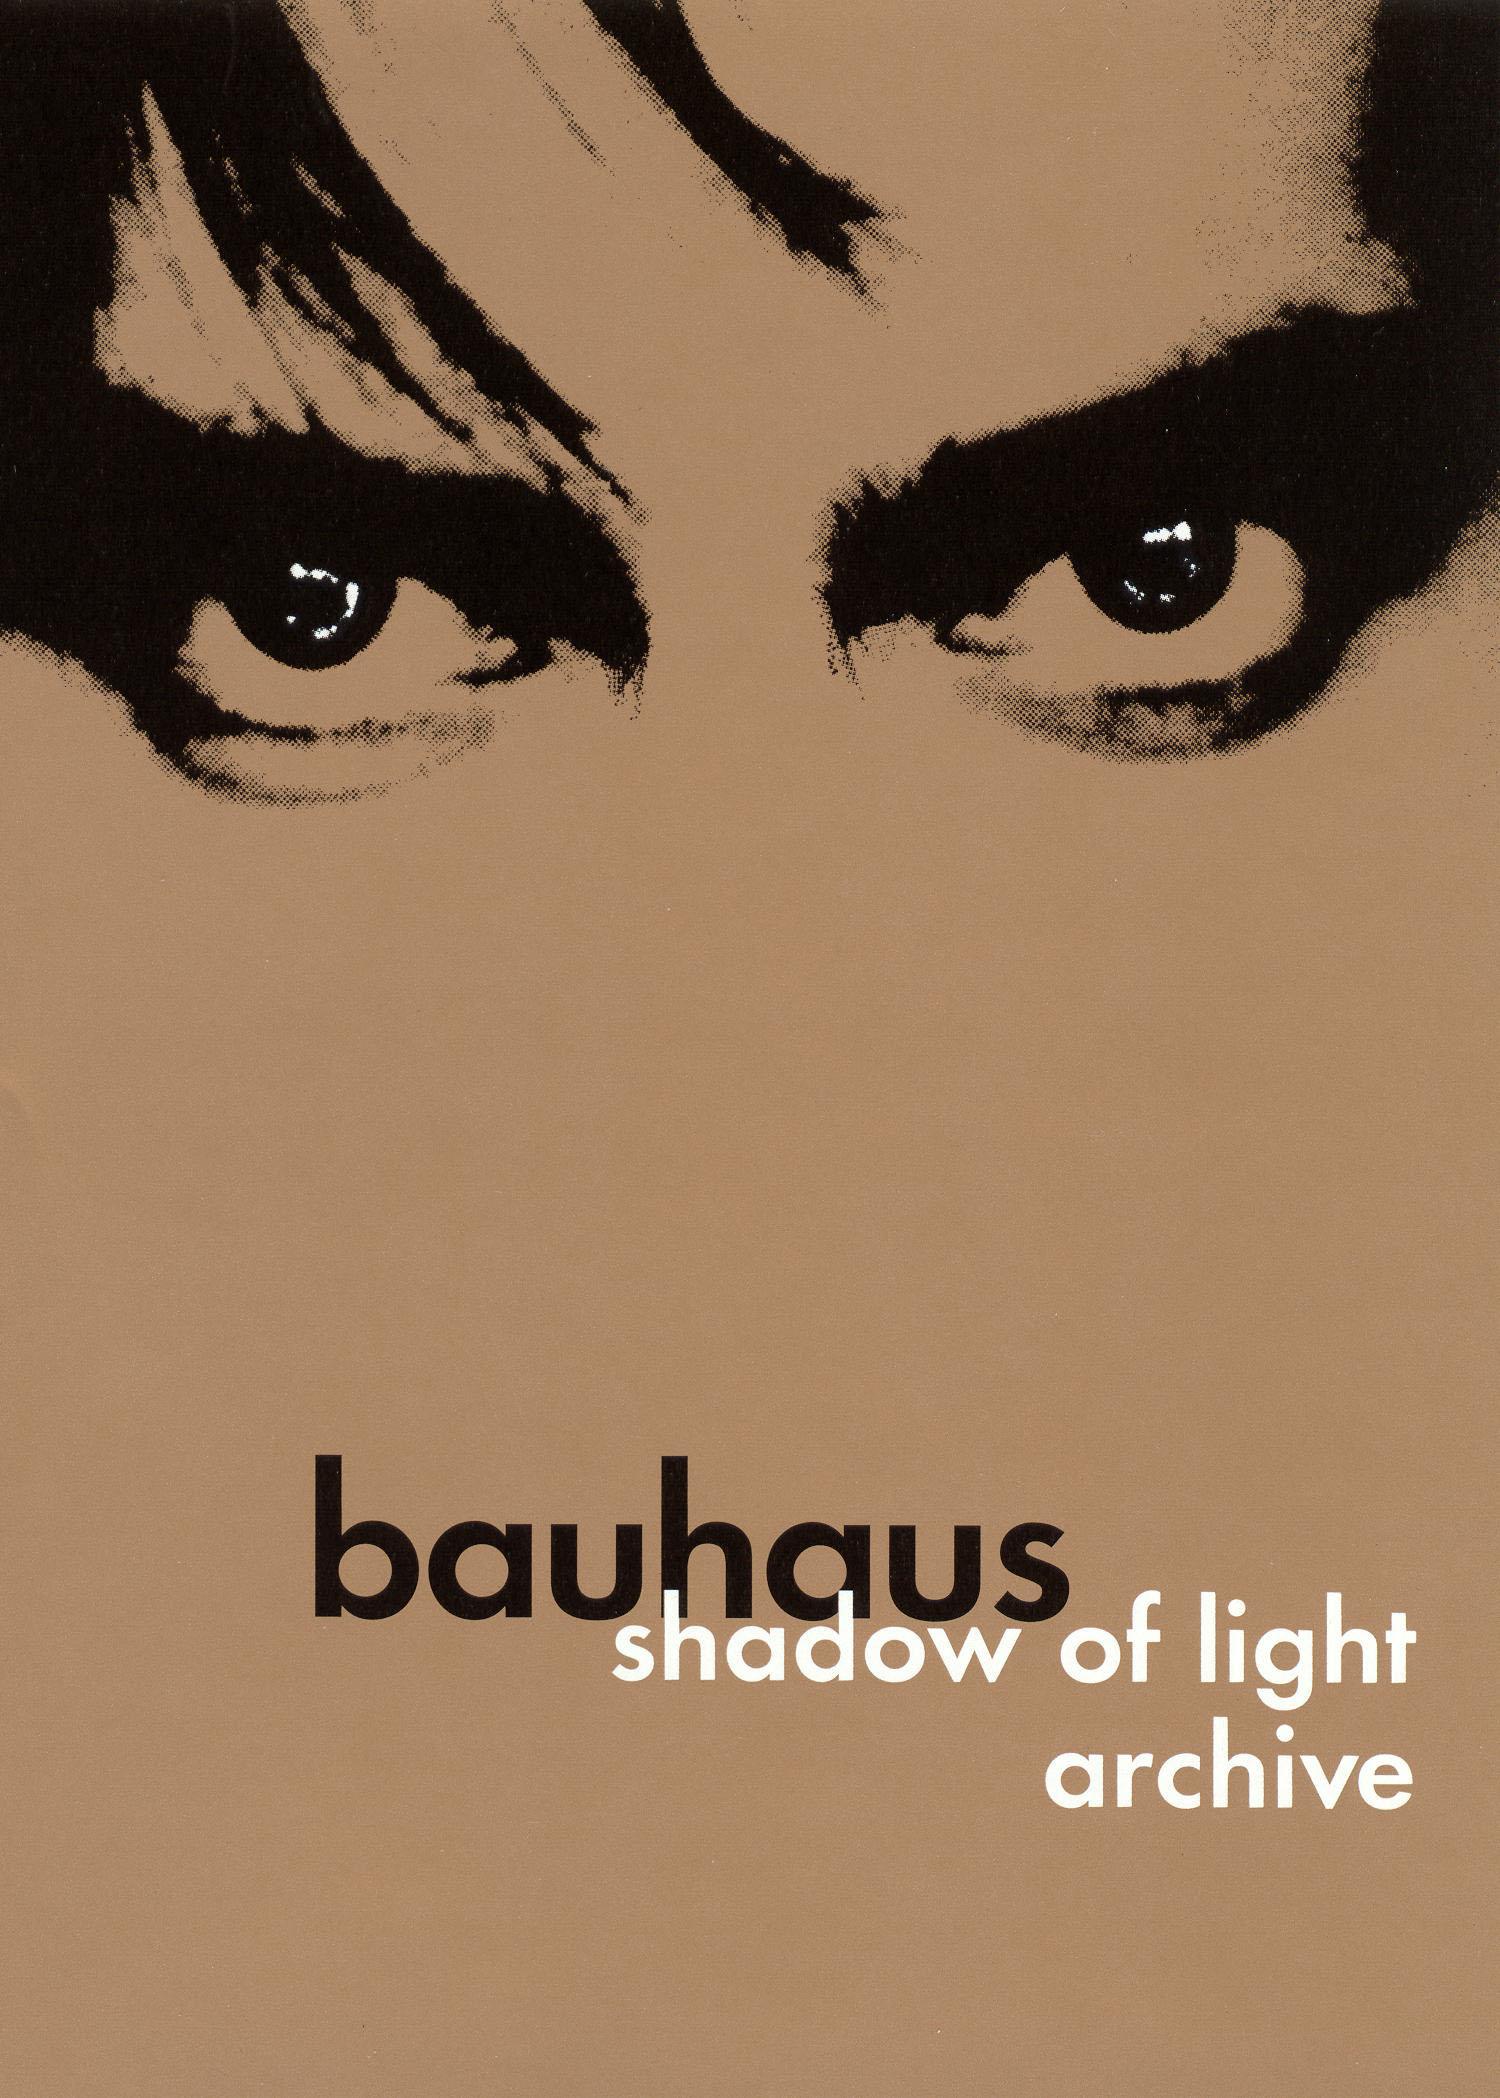 Bauhaus: Shadow of Light